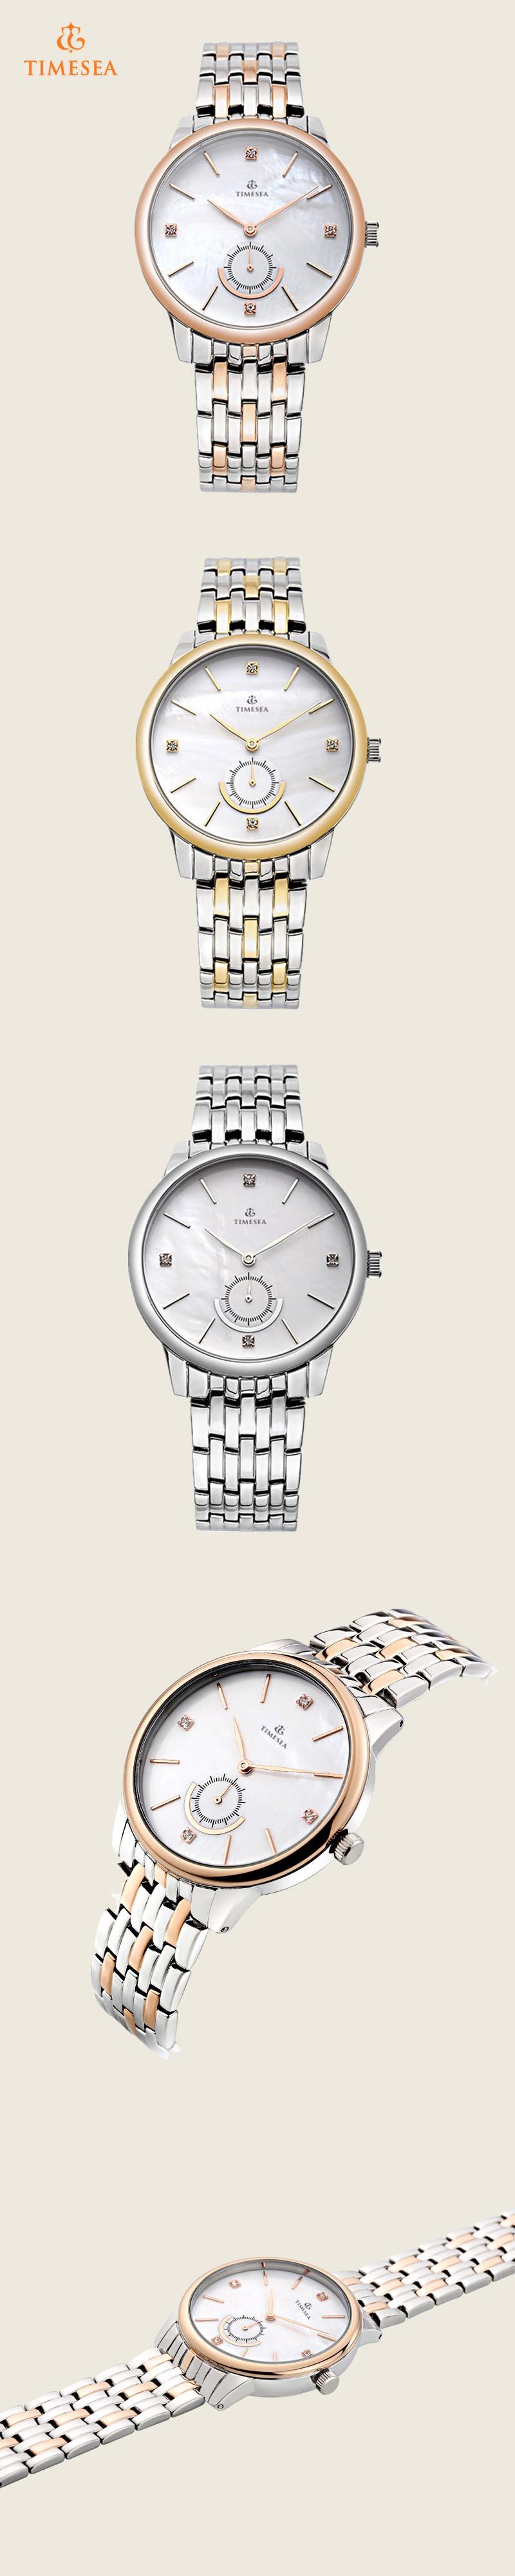 Charm Fashion Wrist Watch for Men 72326